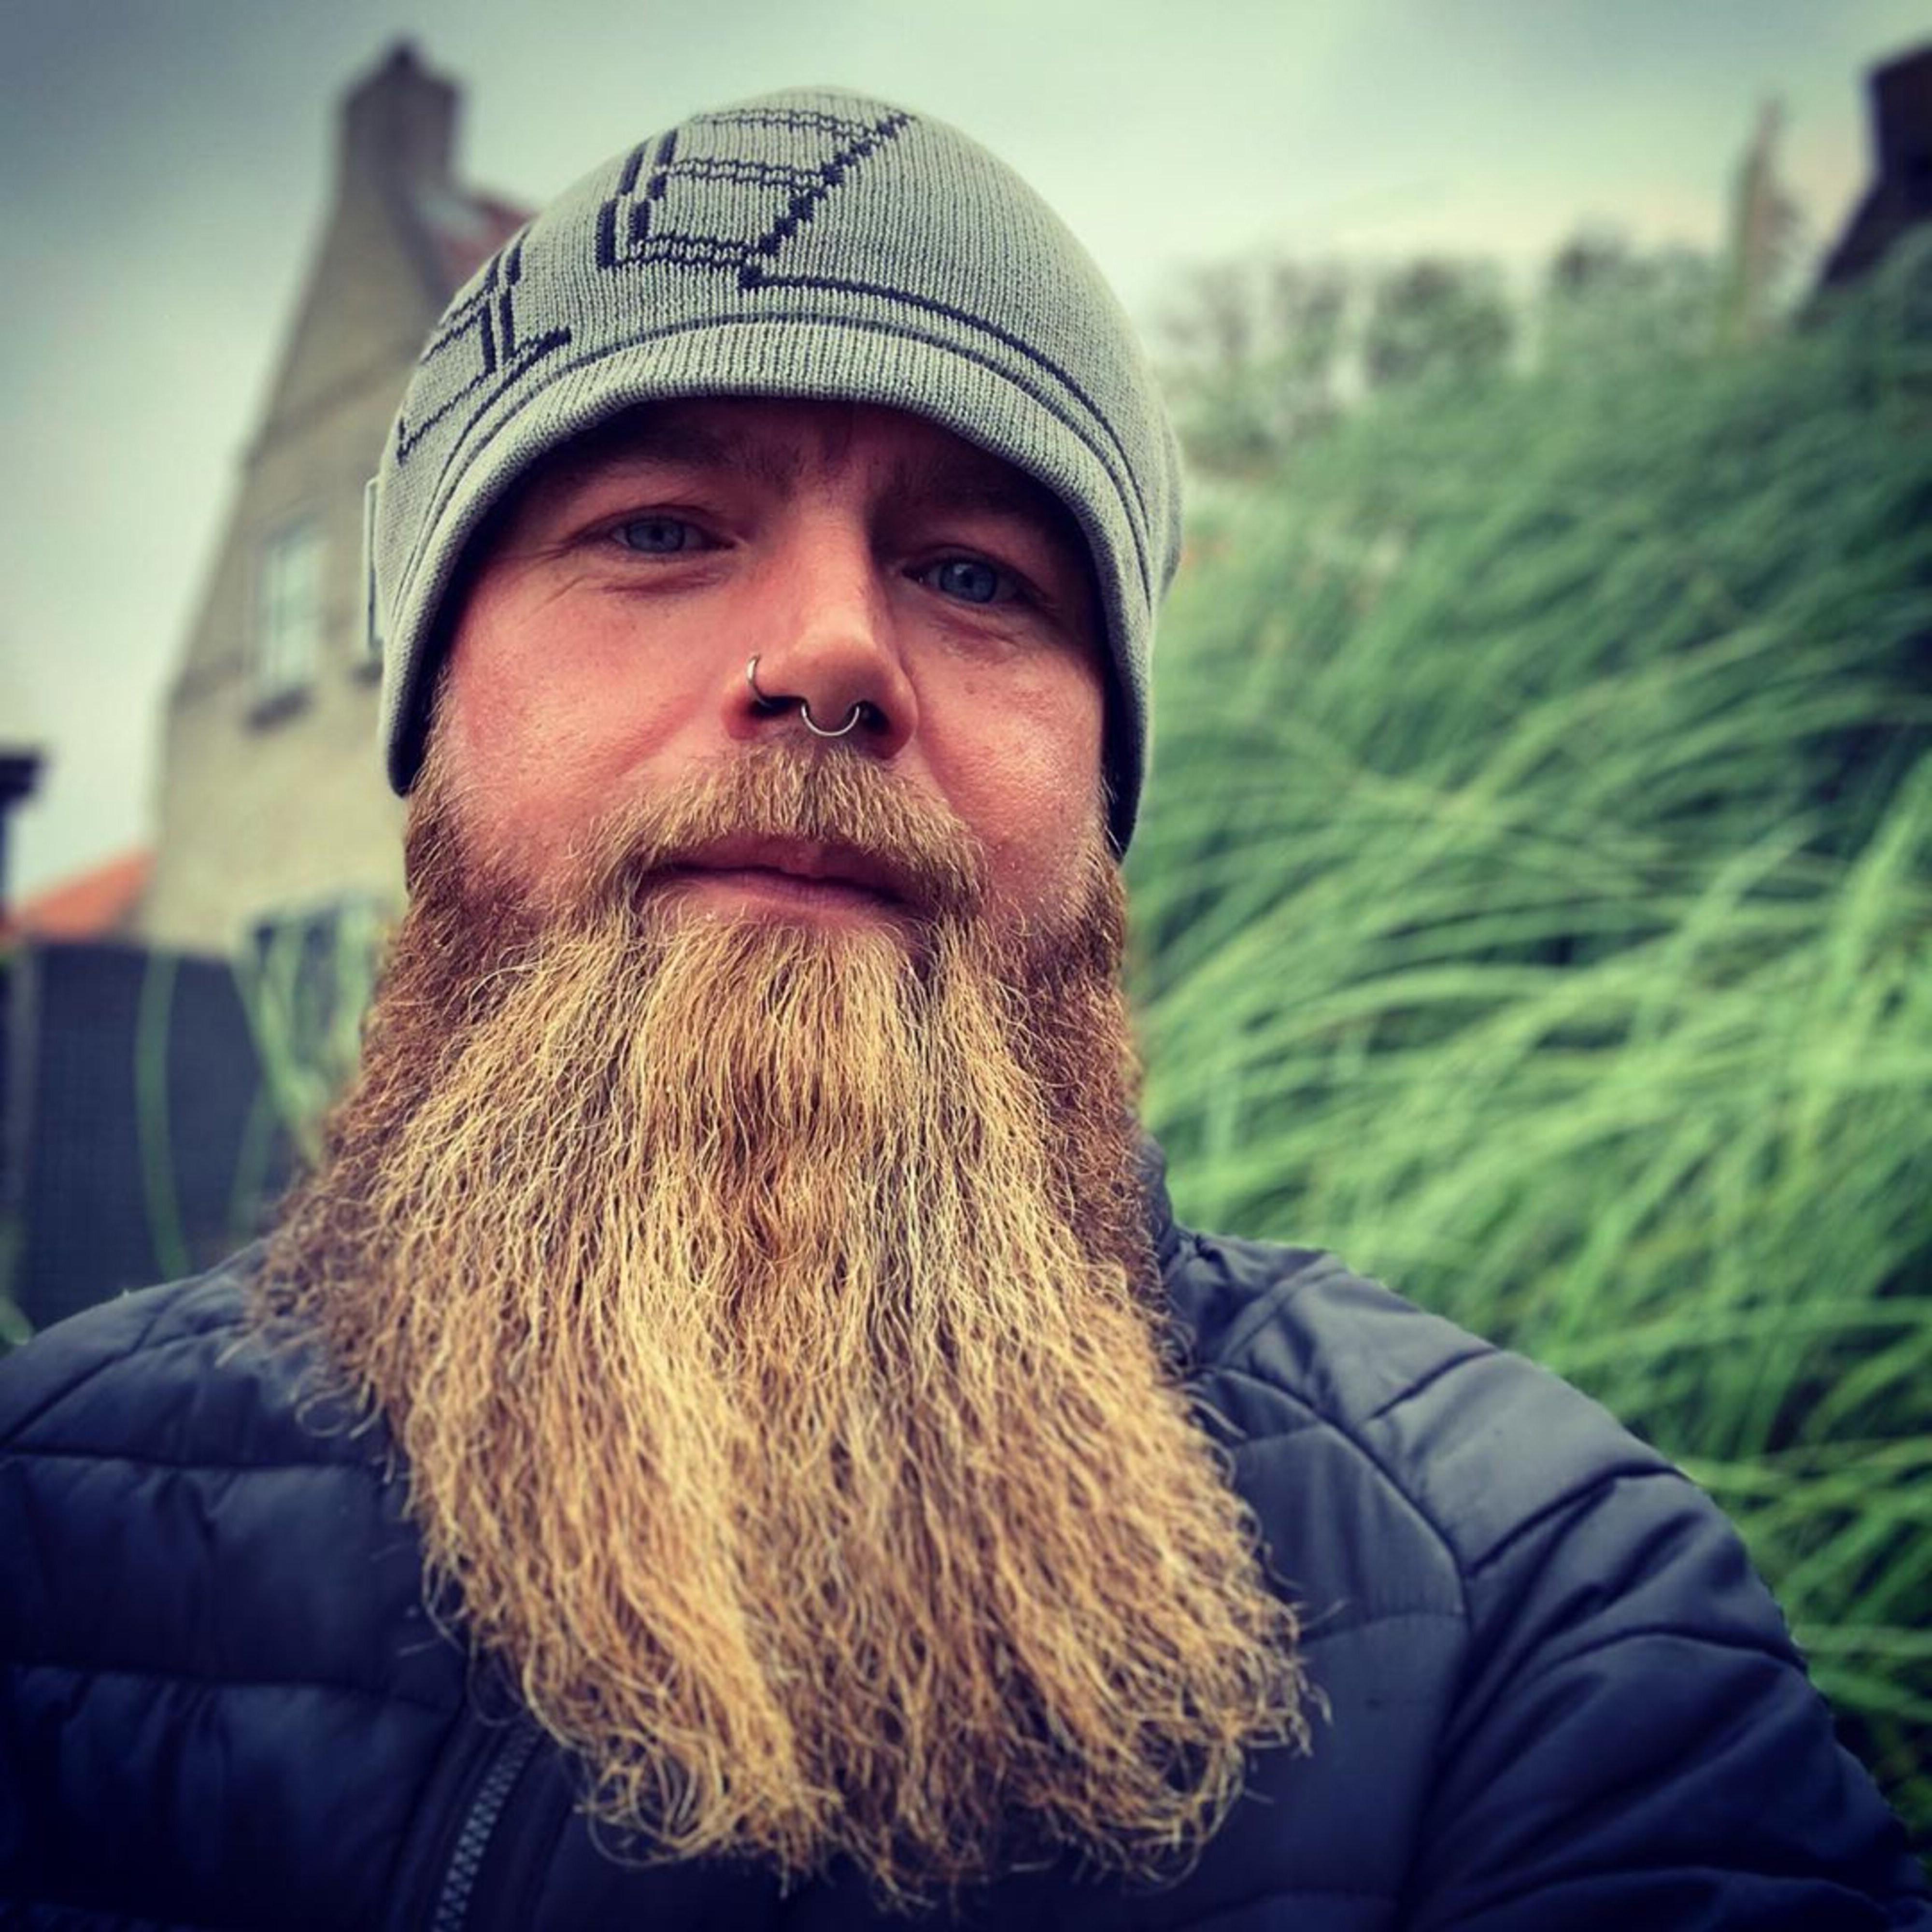 A long beard of the brown hair.